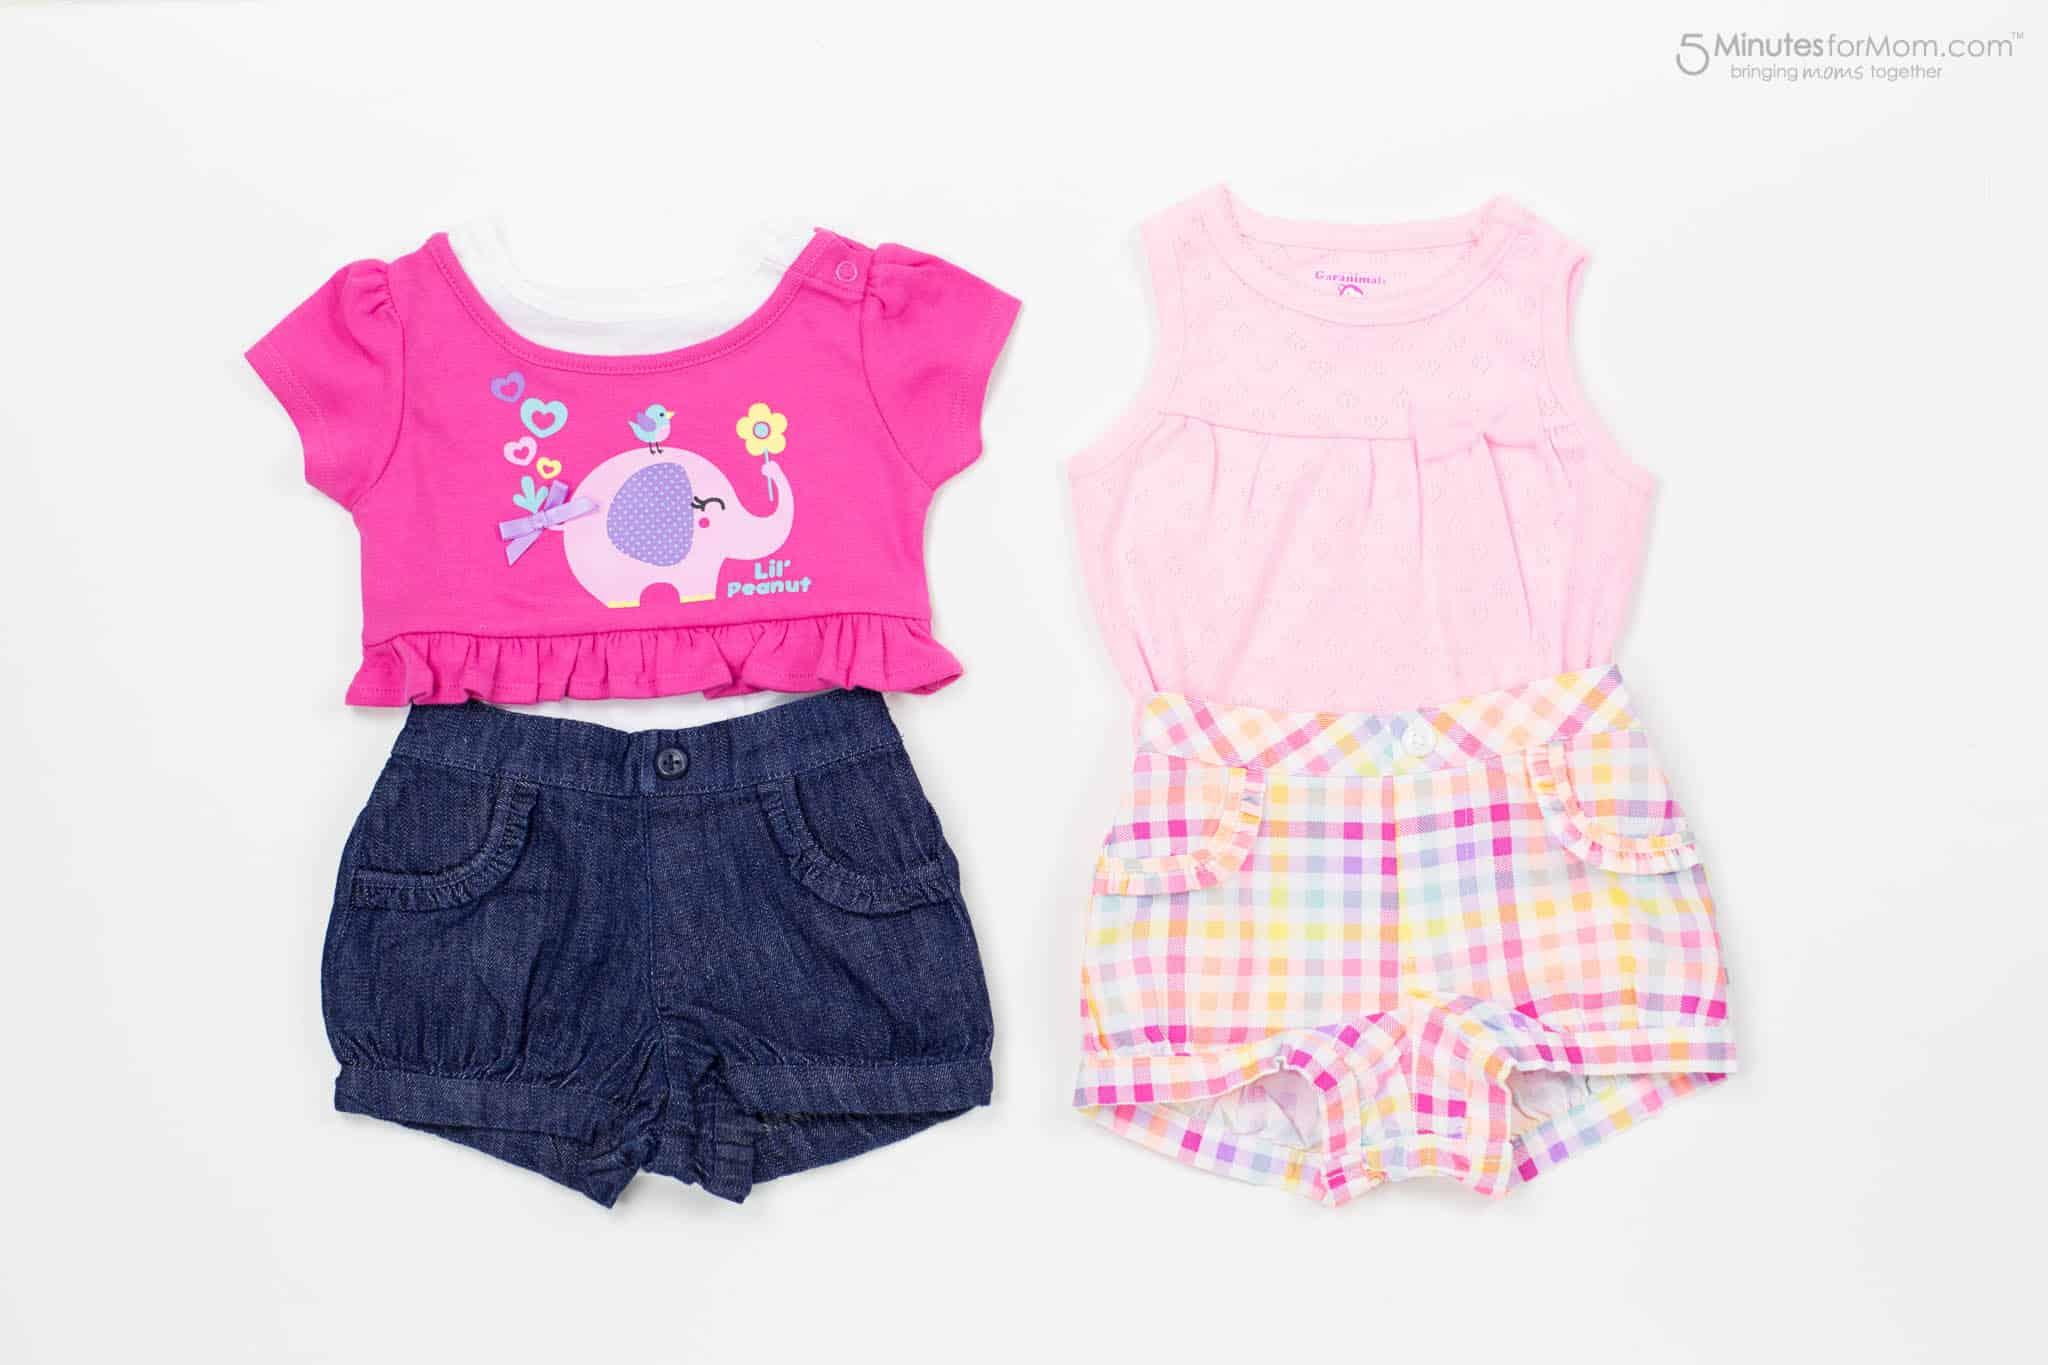 Garanimals Mix and Match Infants Clothes